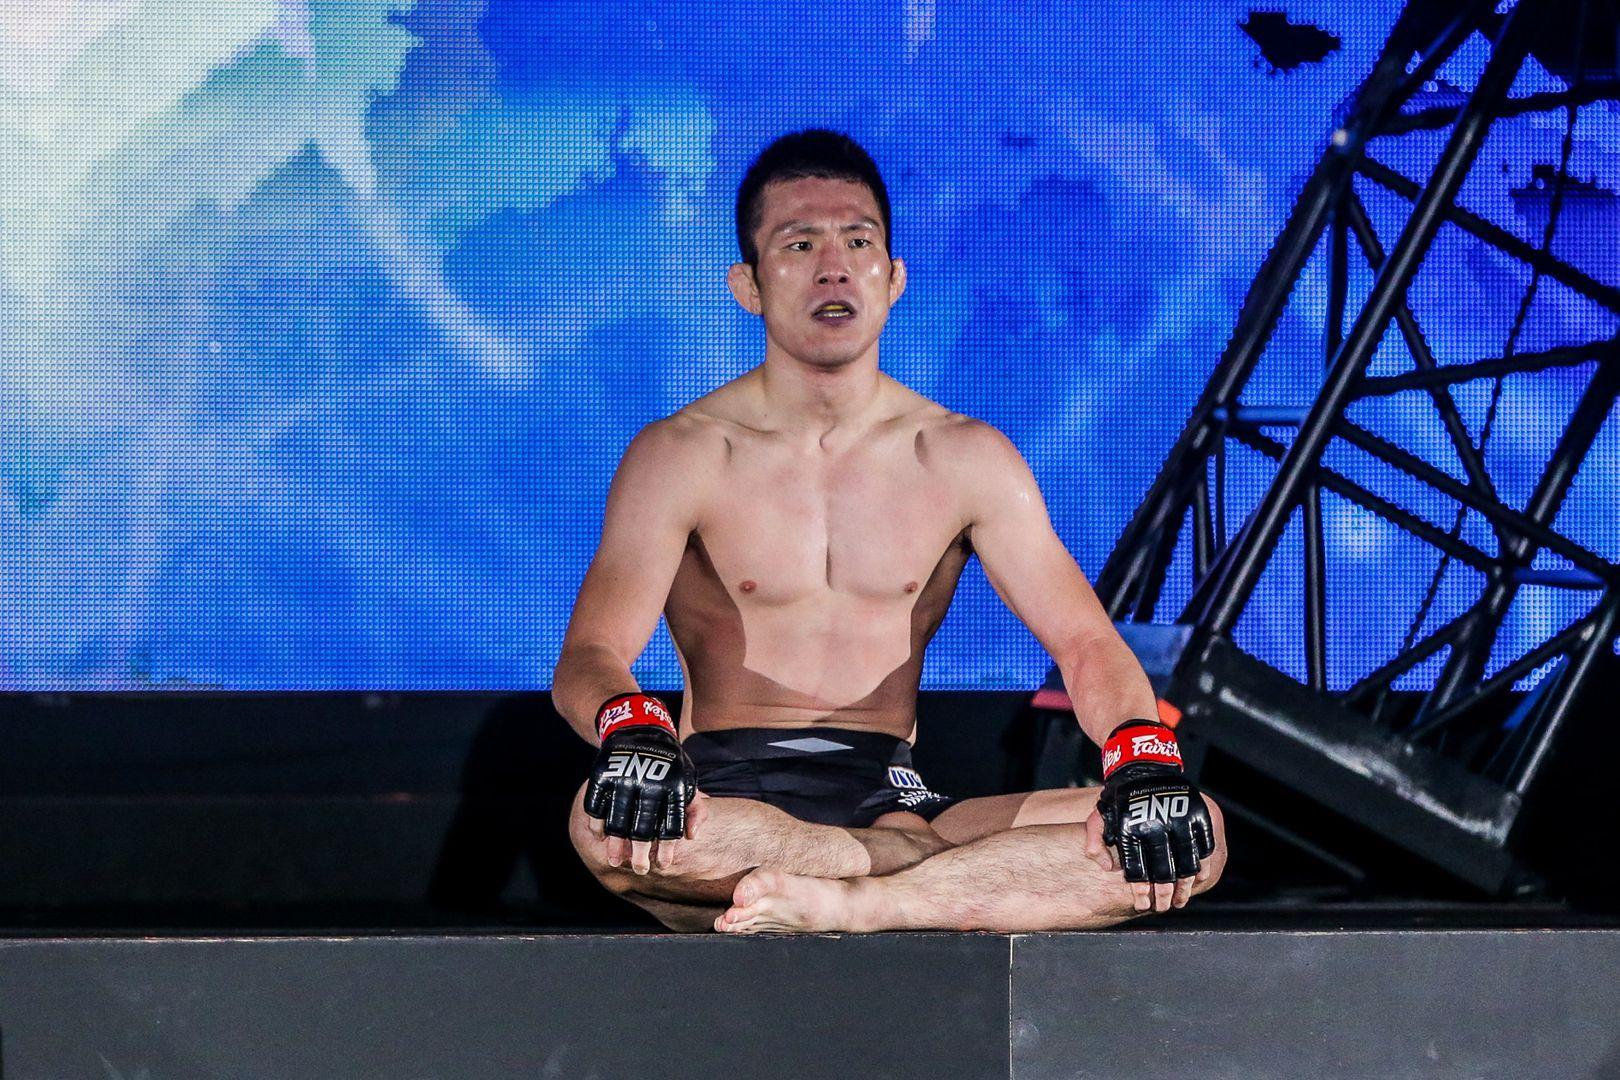 Former ONE Lightweight World Champion Shinya Aoki sits on the ramp following his win over Honorio Banario